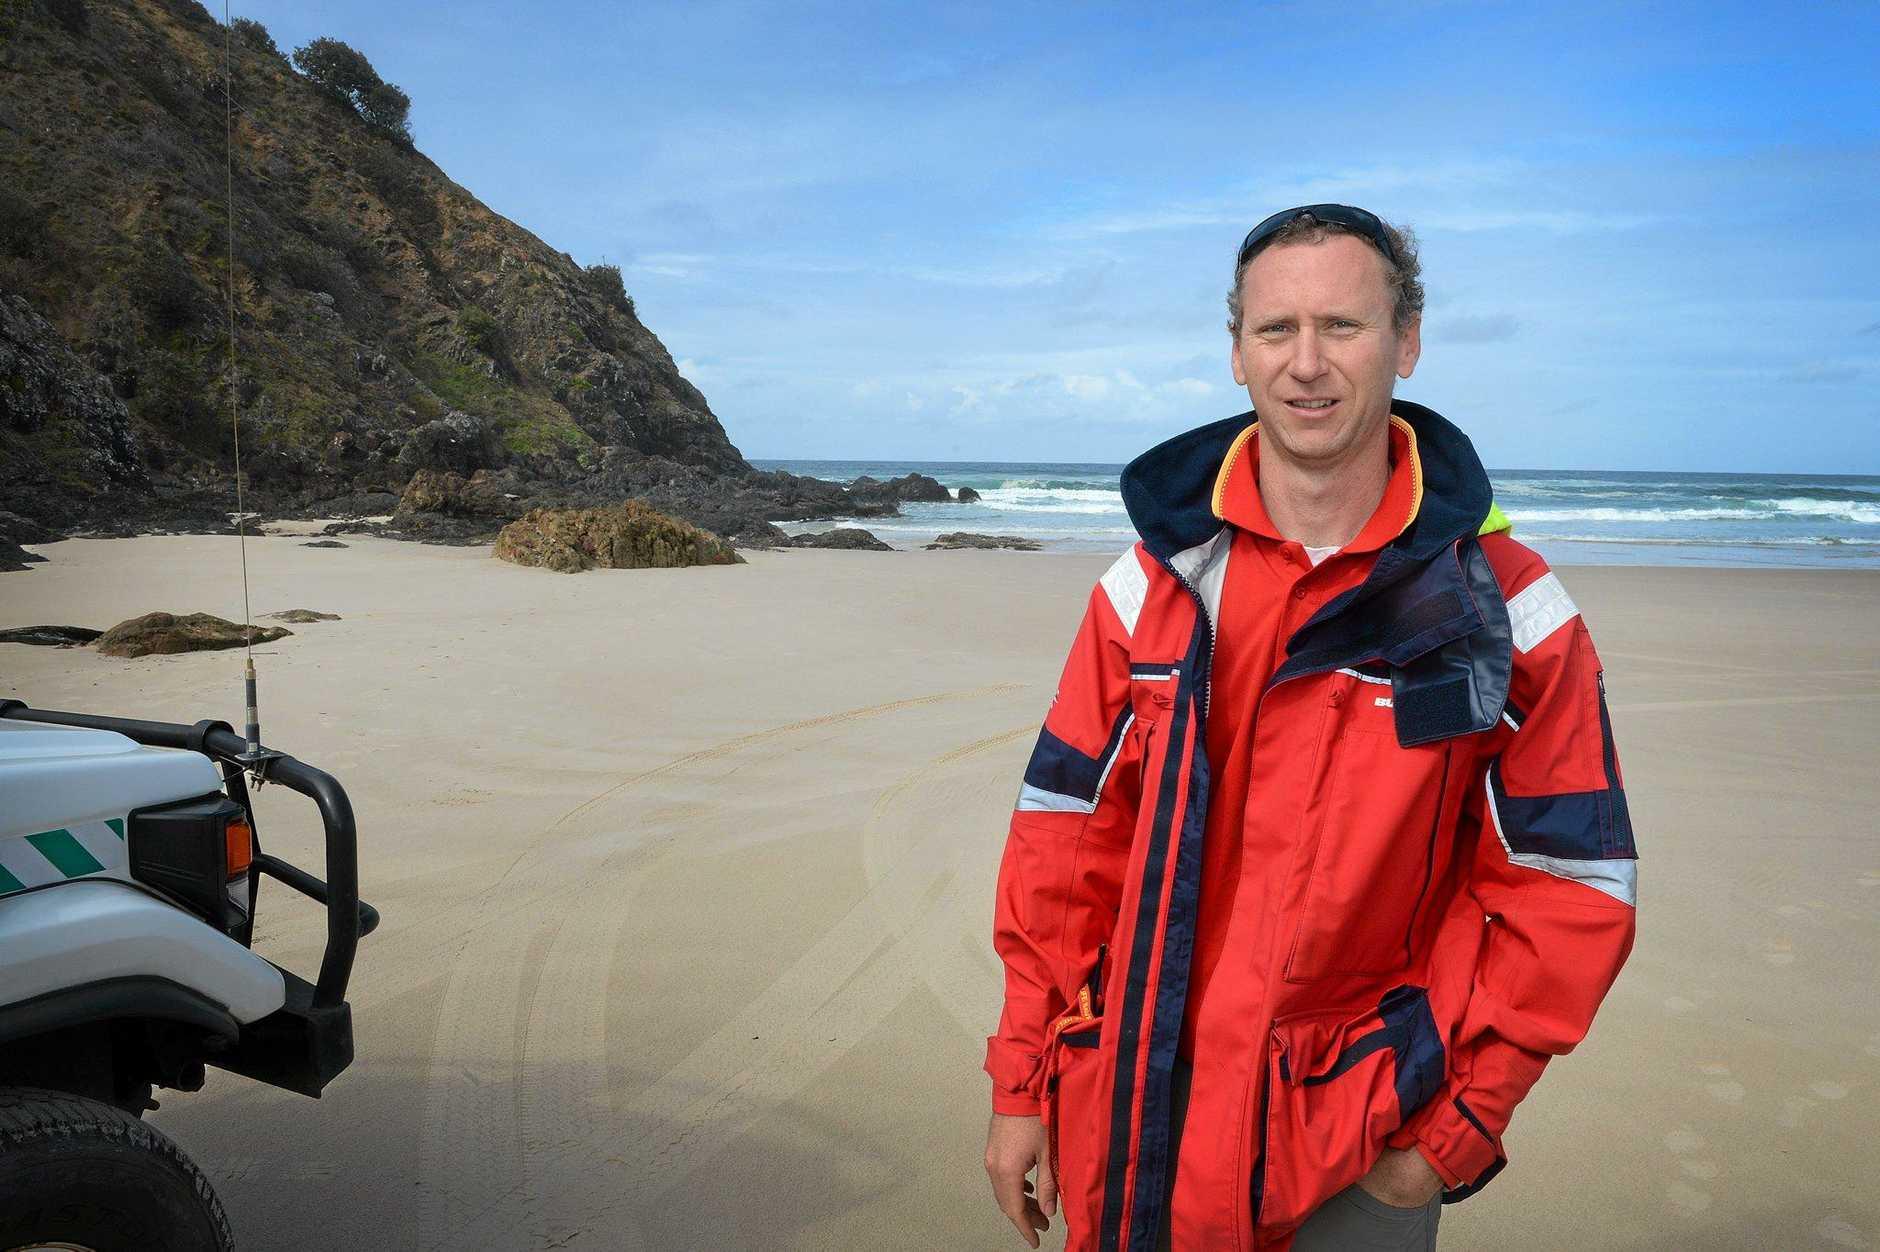 Jimmy Keough, surf life saving Far North Coast.